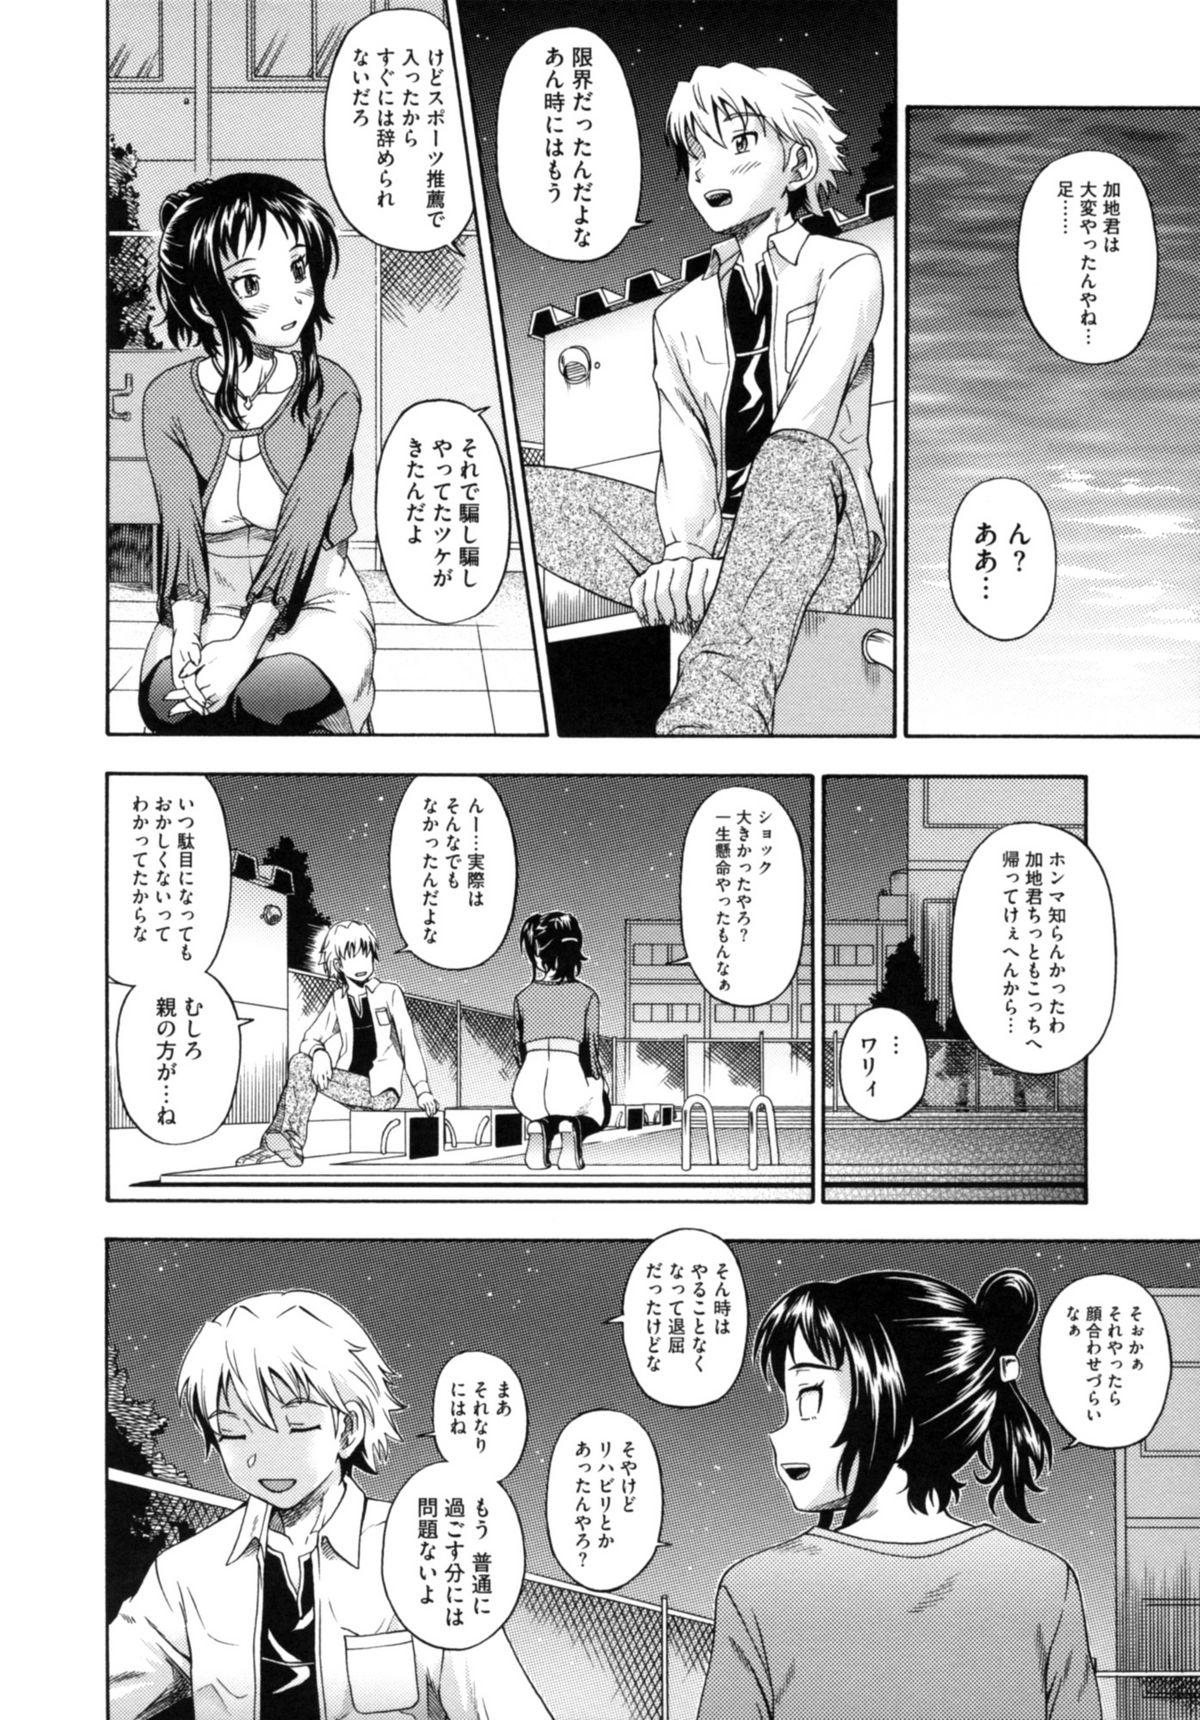 Soushisouai Note Nisatsume 179